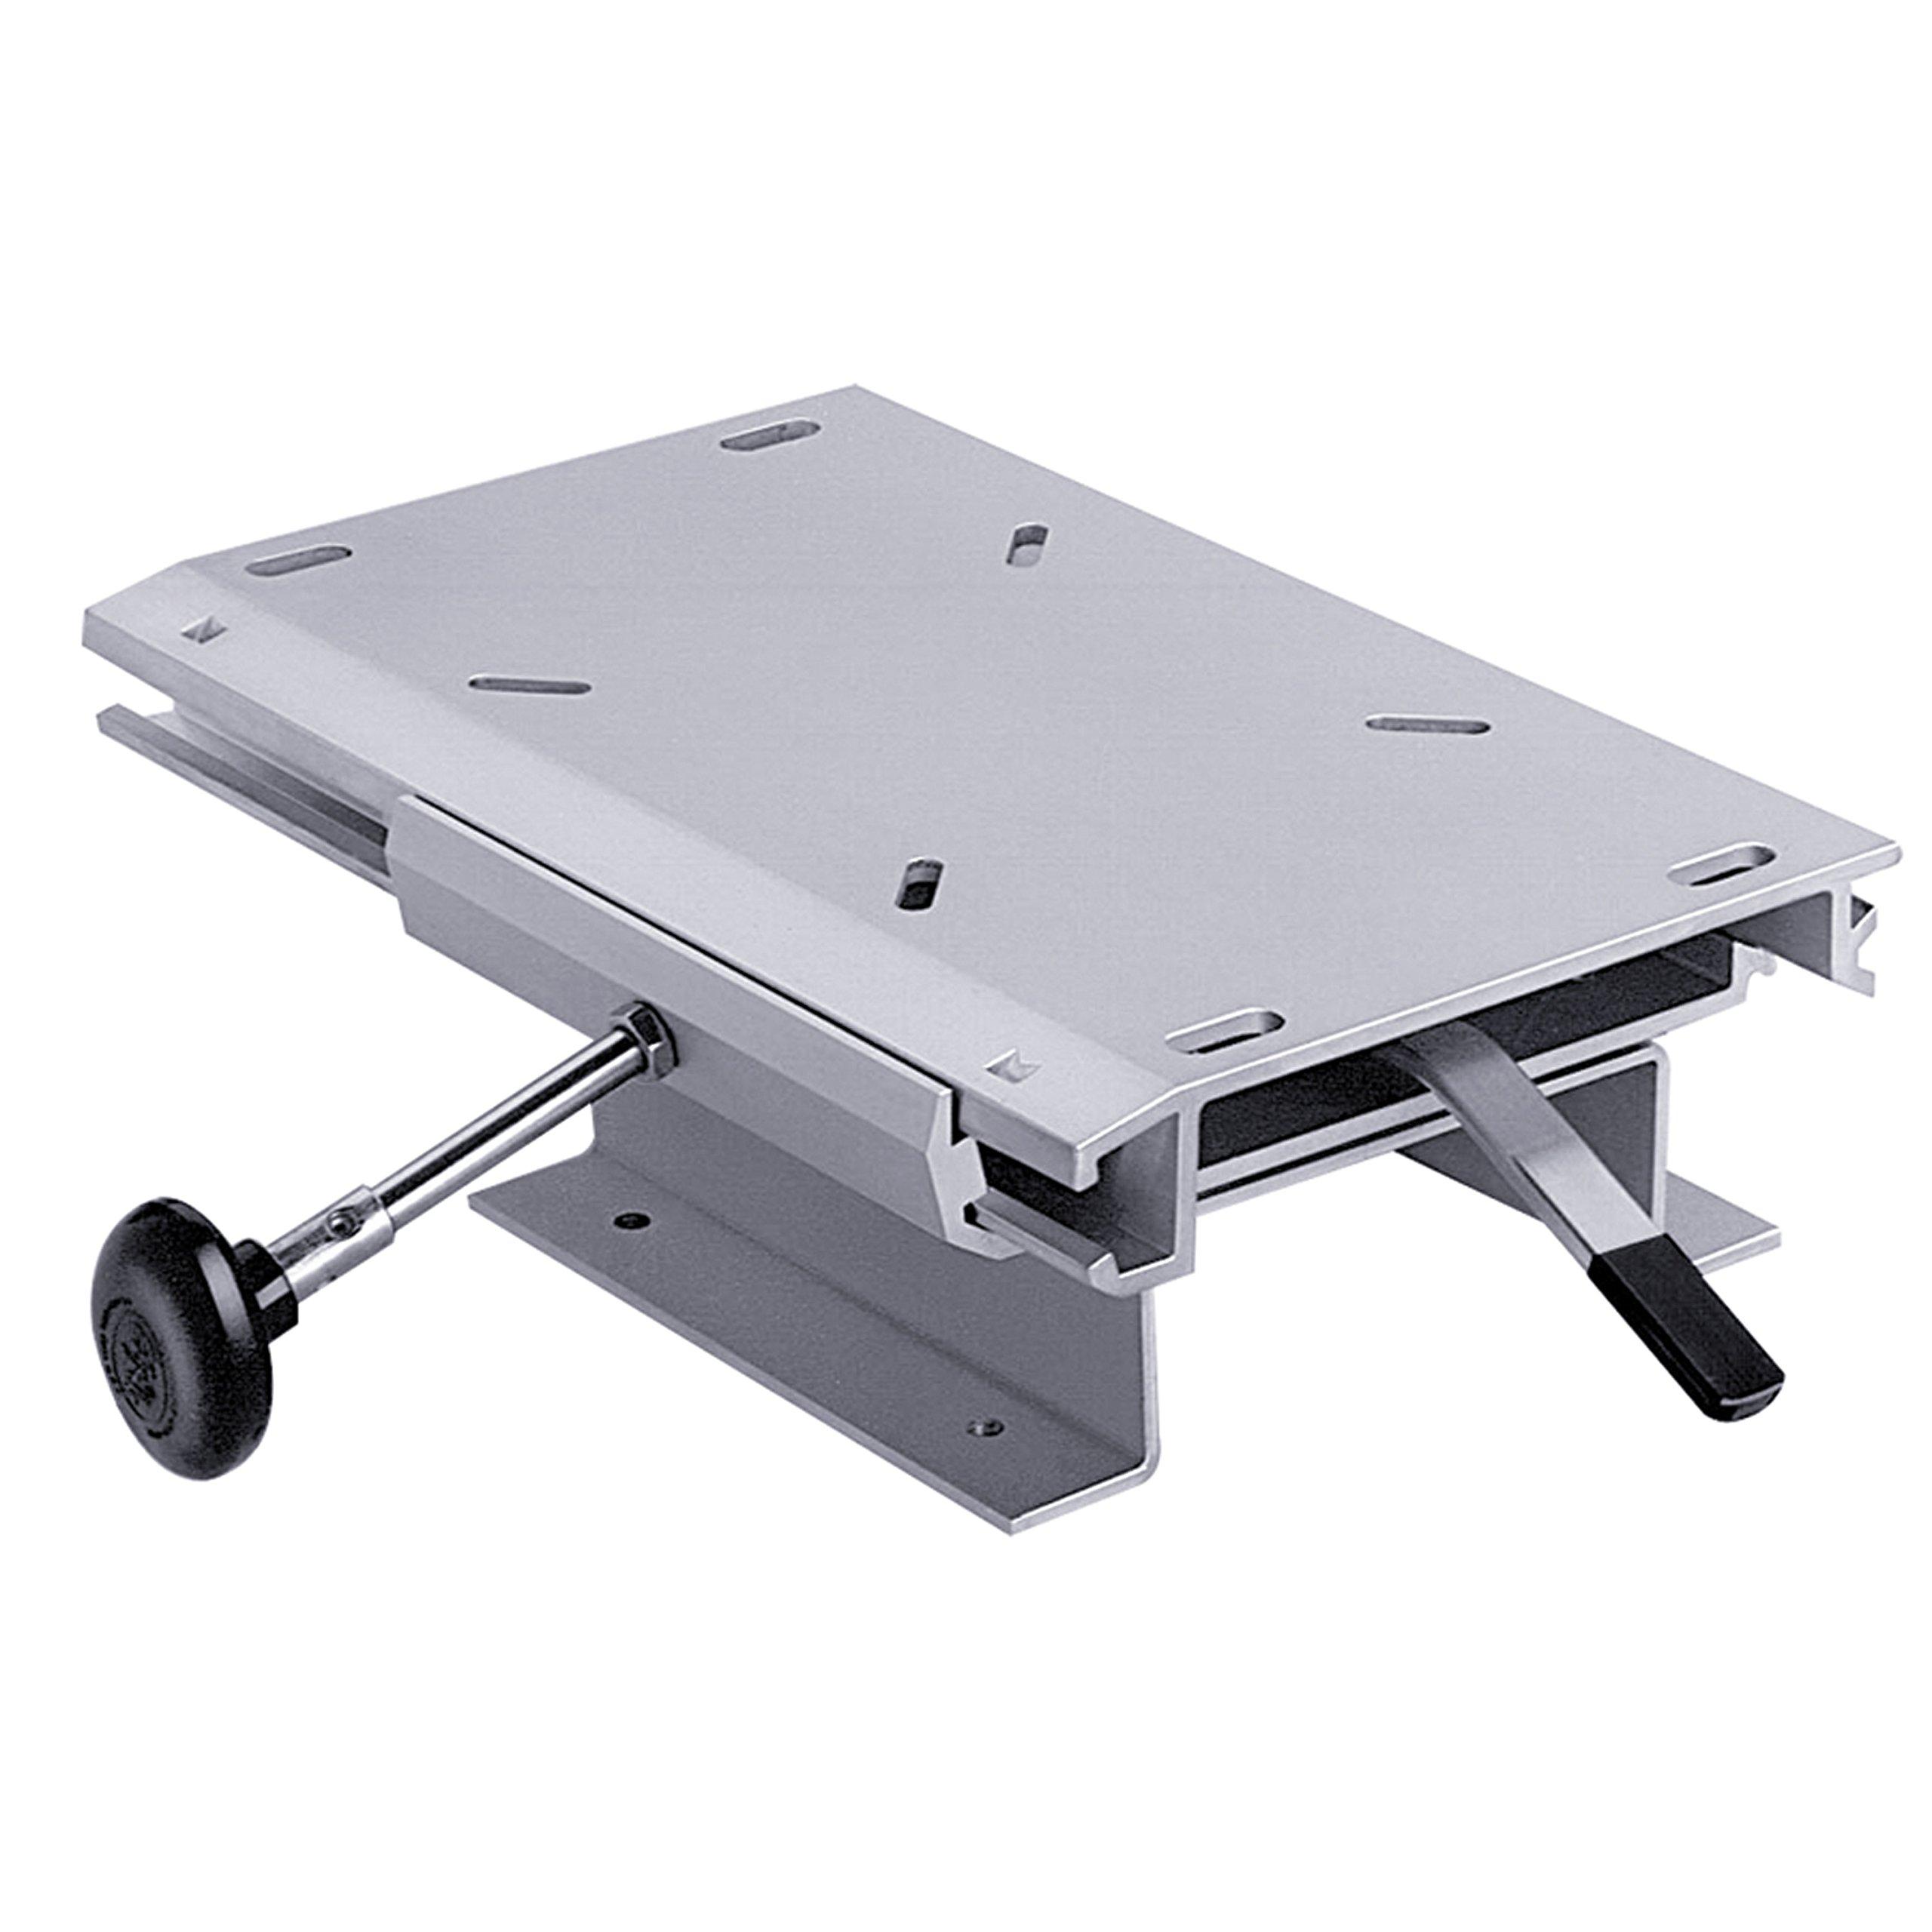 Garelick/Eez-In 75090:01 Low Profile Seat Slide and Locking Swivel